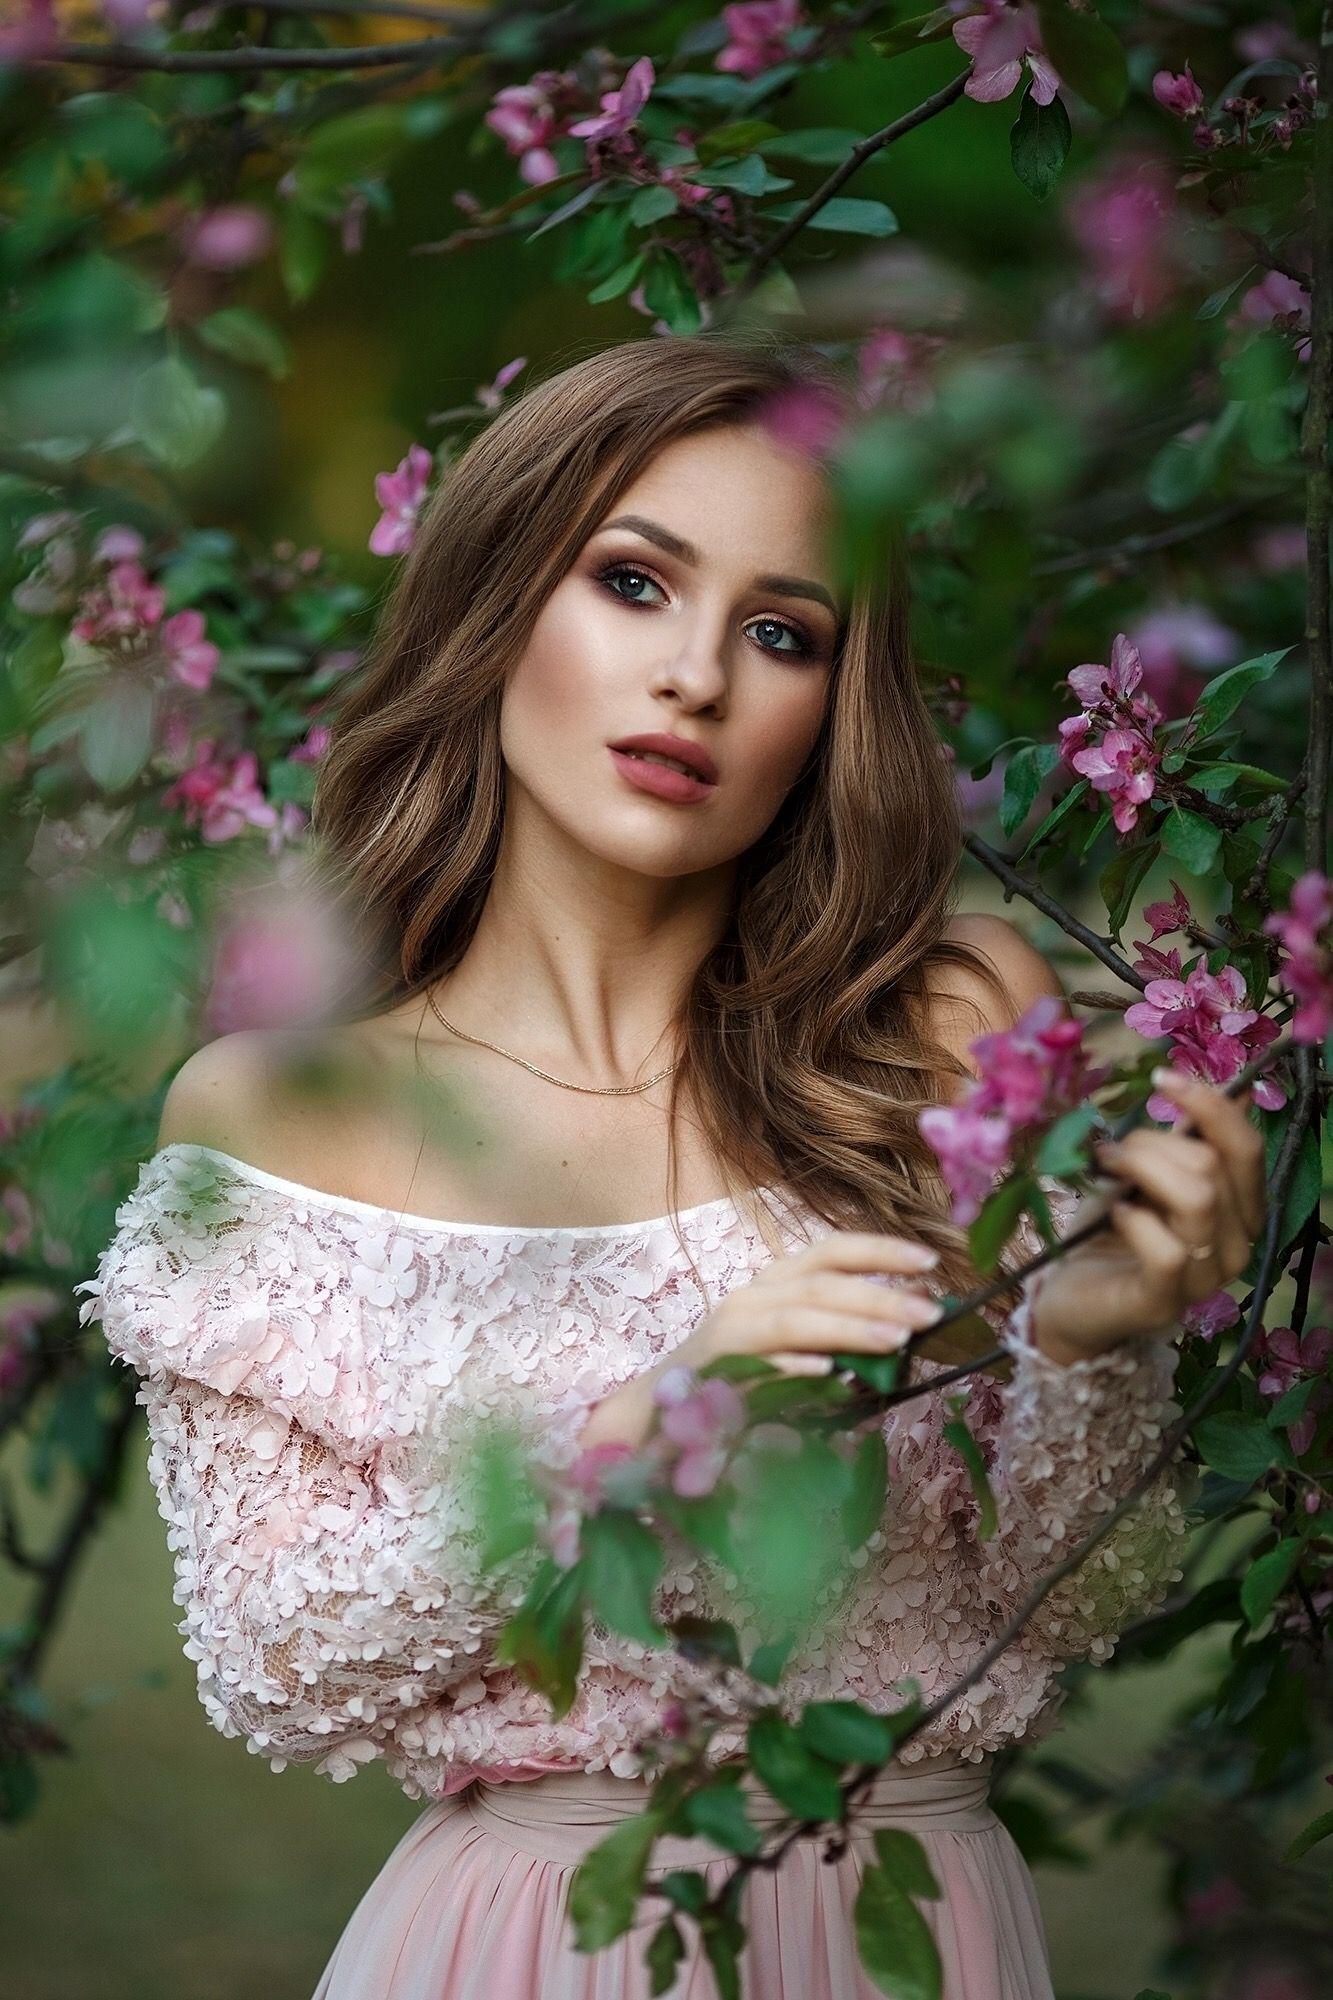 available light portrait (model - Anelisa) - Tangents